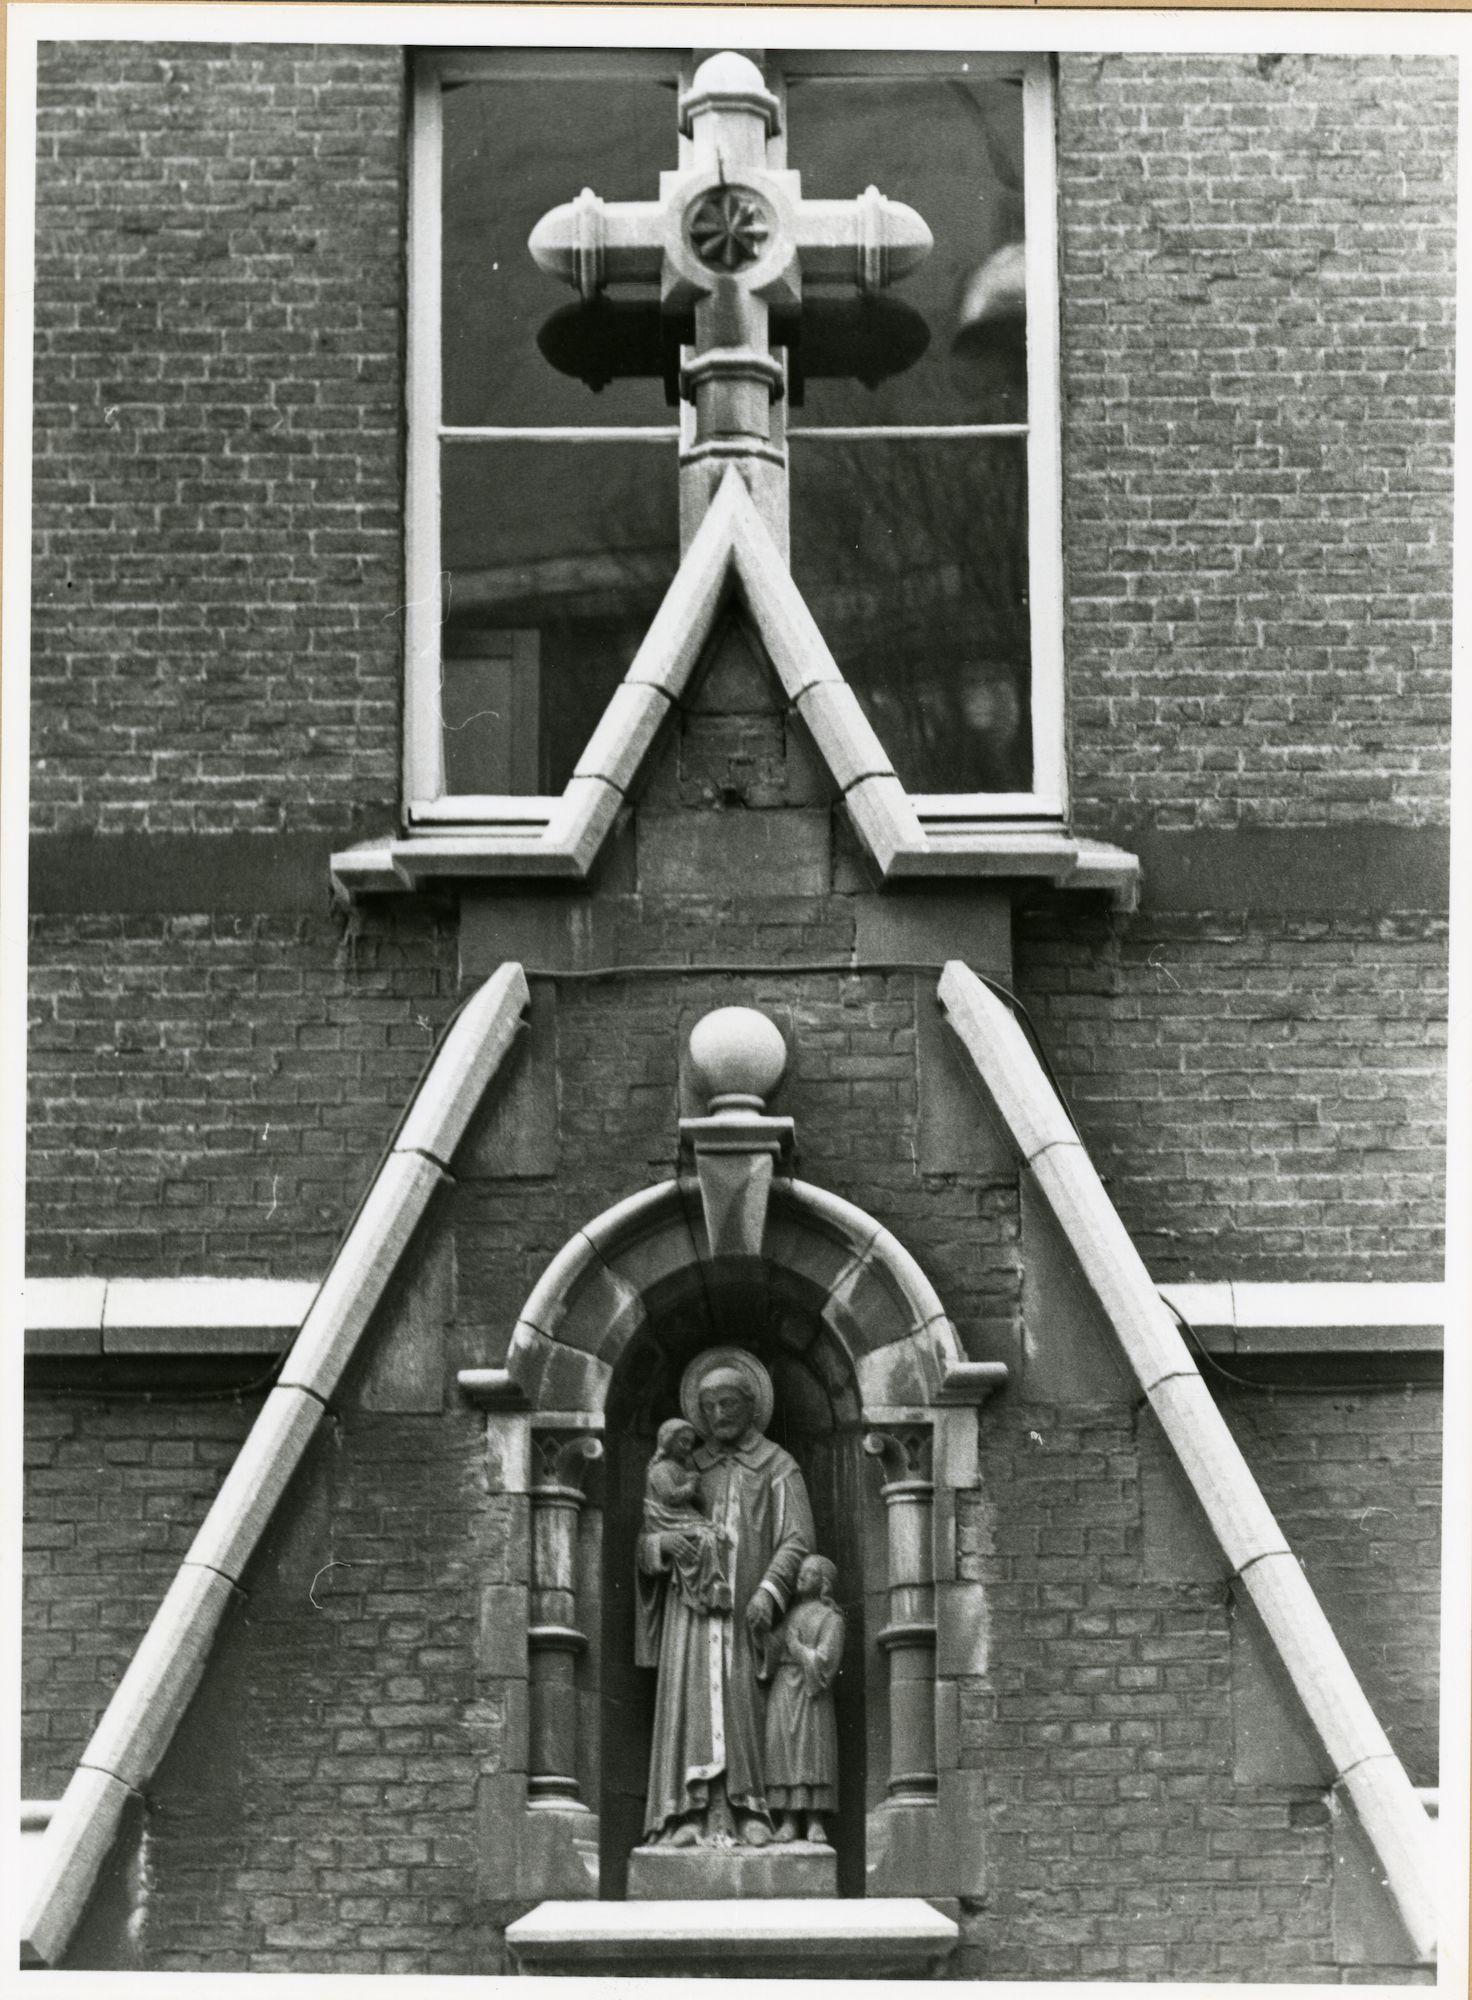 Gent: Limburgstraat 12: Gevelbeeld